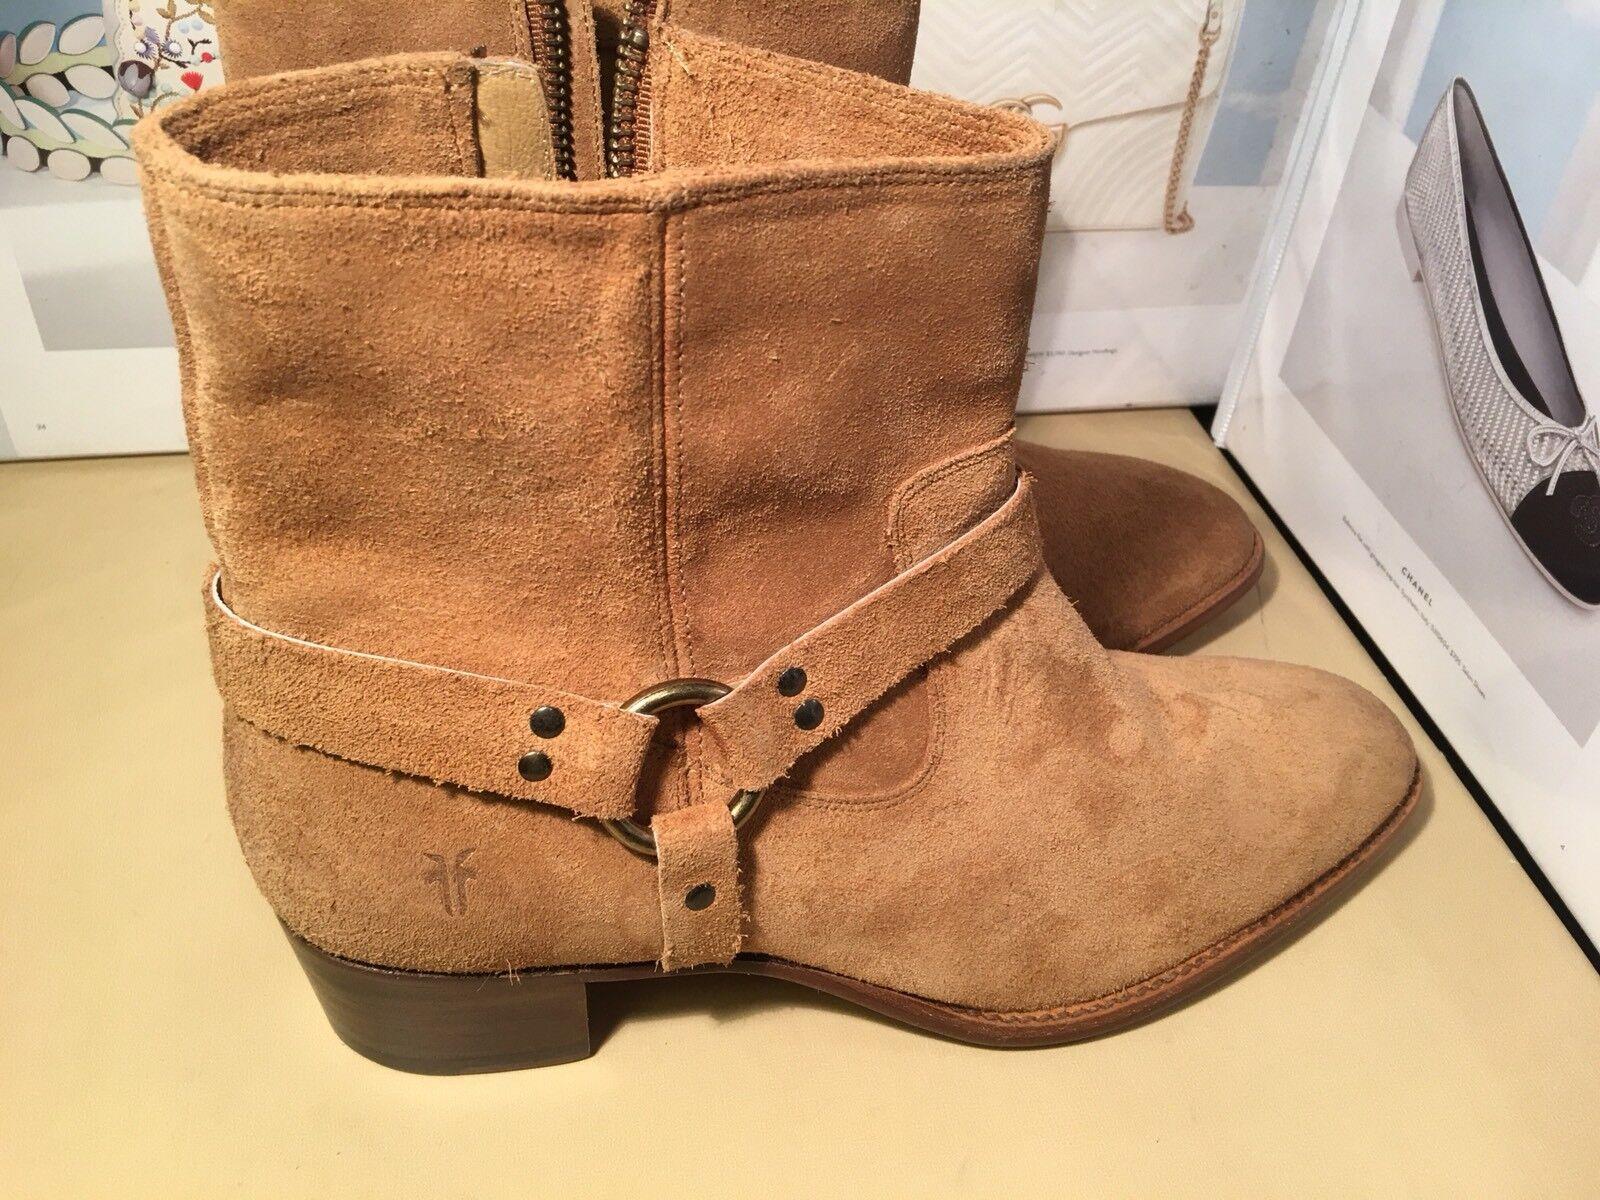 Frye Women's Dara Harness Short Sand Suede Boot SZ 10